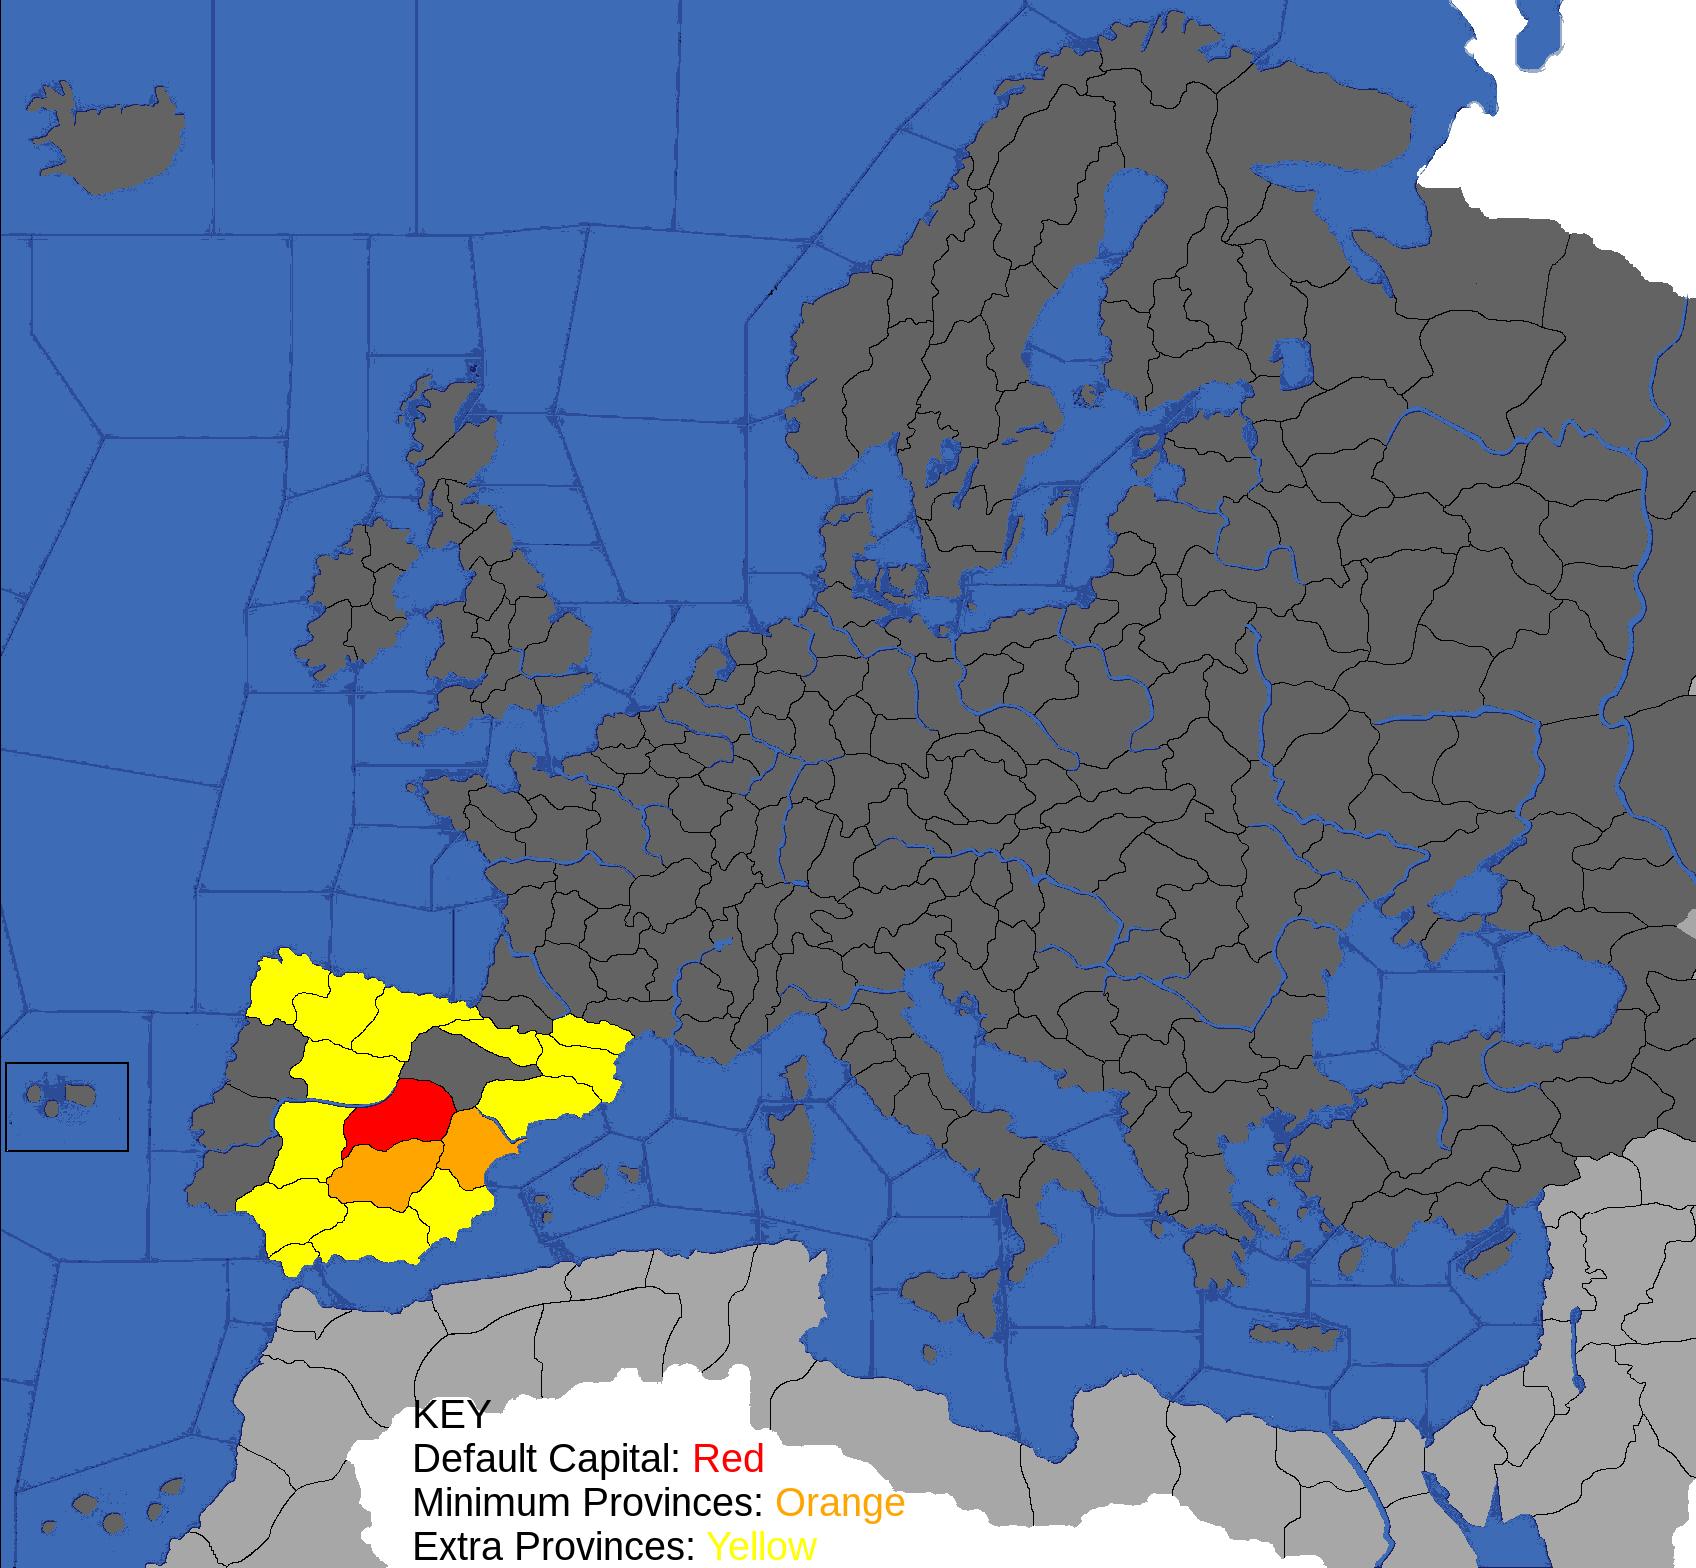 Map Of Spain 1492.Spain Europa Universalis Ii Eu Wiki Fandom Powered By Wikia